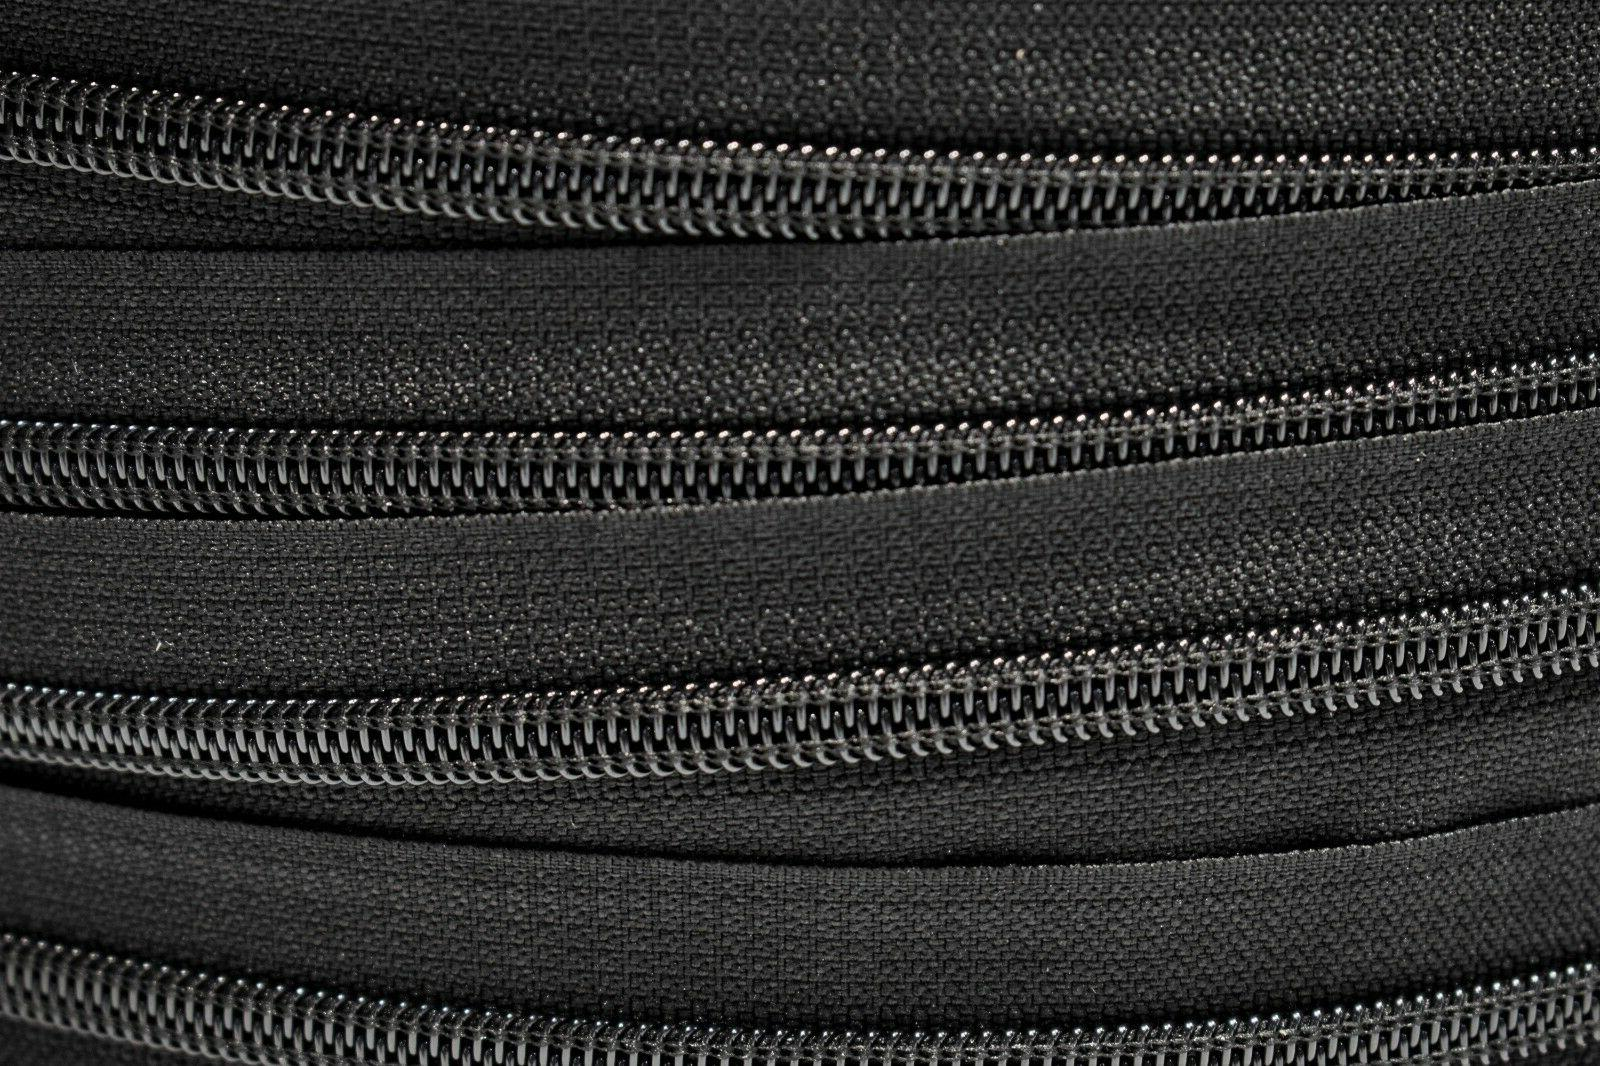 #5 Chain Tape Cloth Fabric